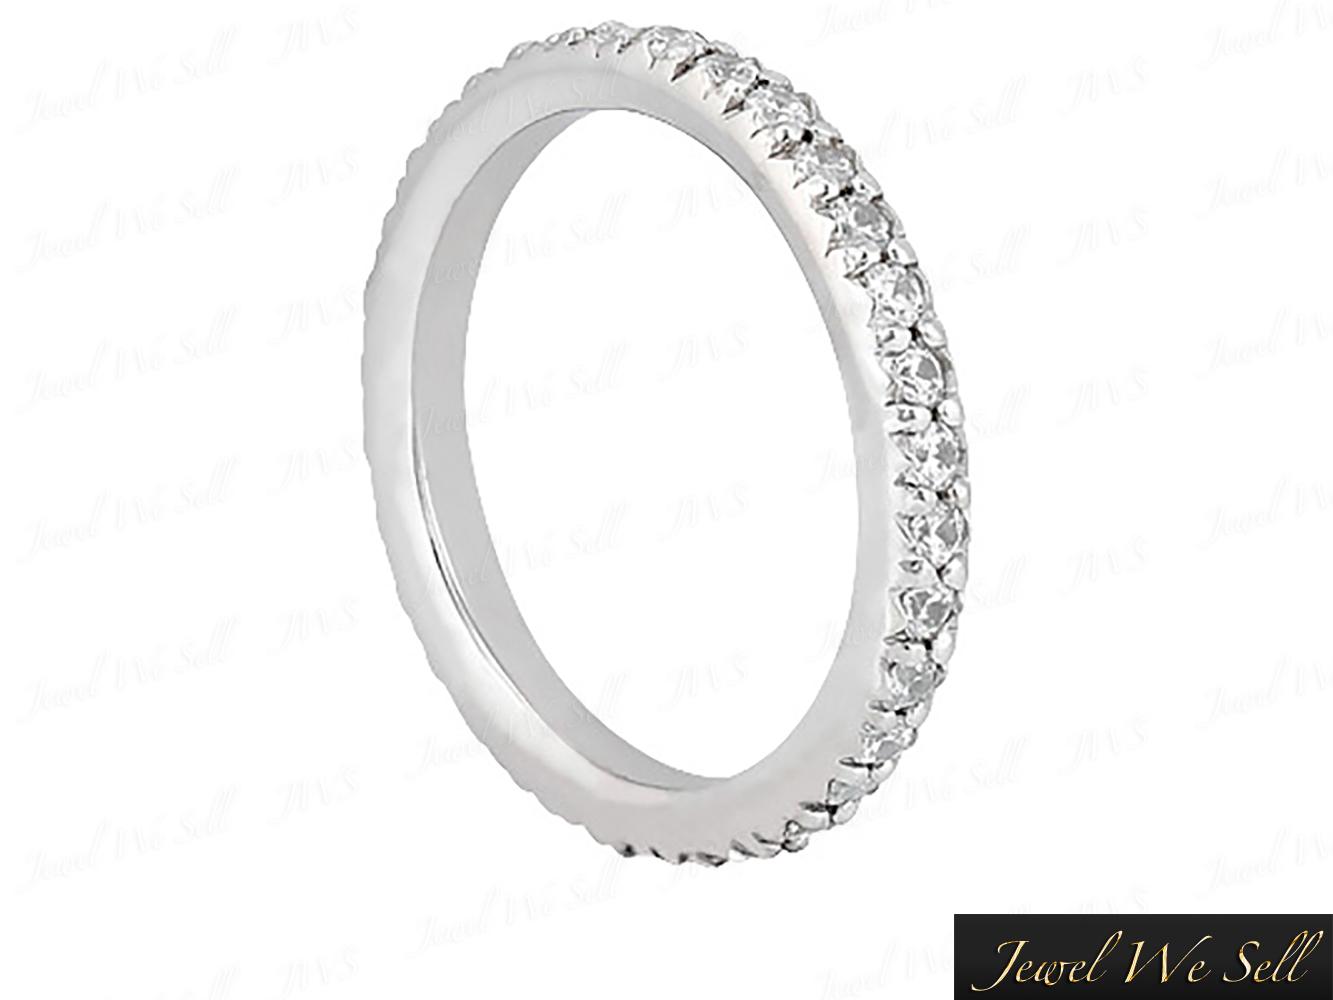 0-70Ct-Round-Cut-Diamond-Pave-Set-Anniversary-Eternity-Band-Ring-10K-Gold-G-H-I1 thumbnail 4